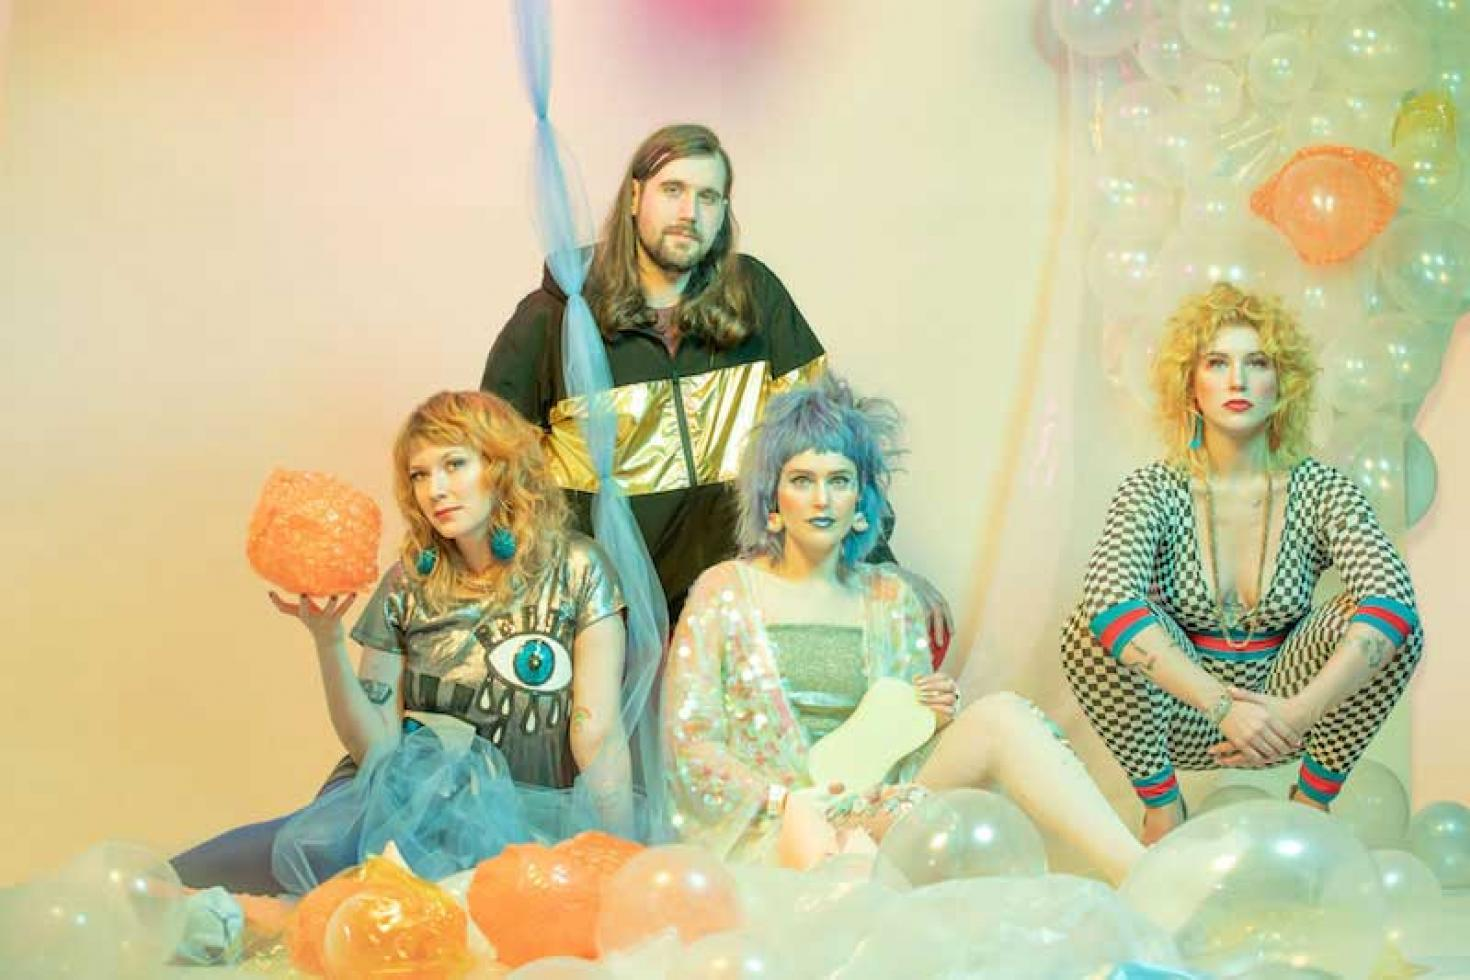 Tacocat share new single & video 'New World'